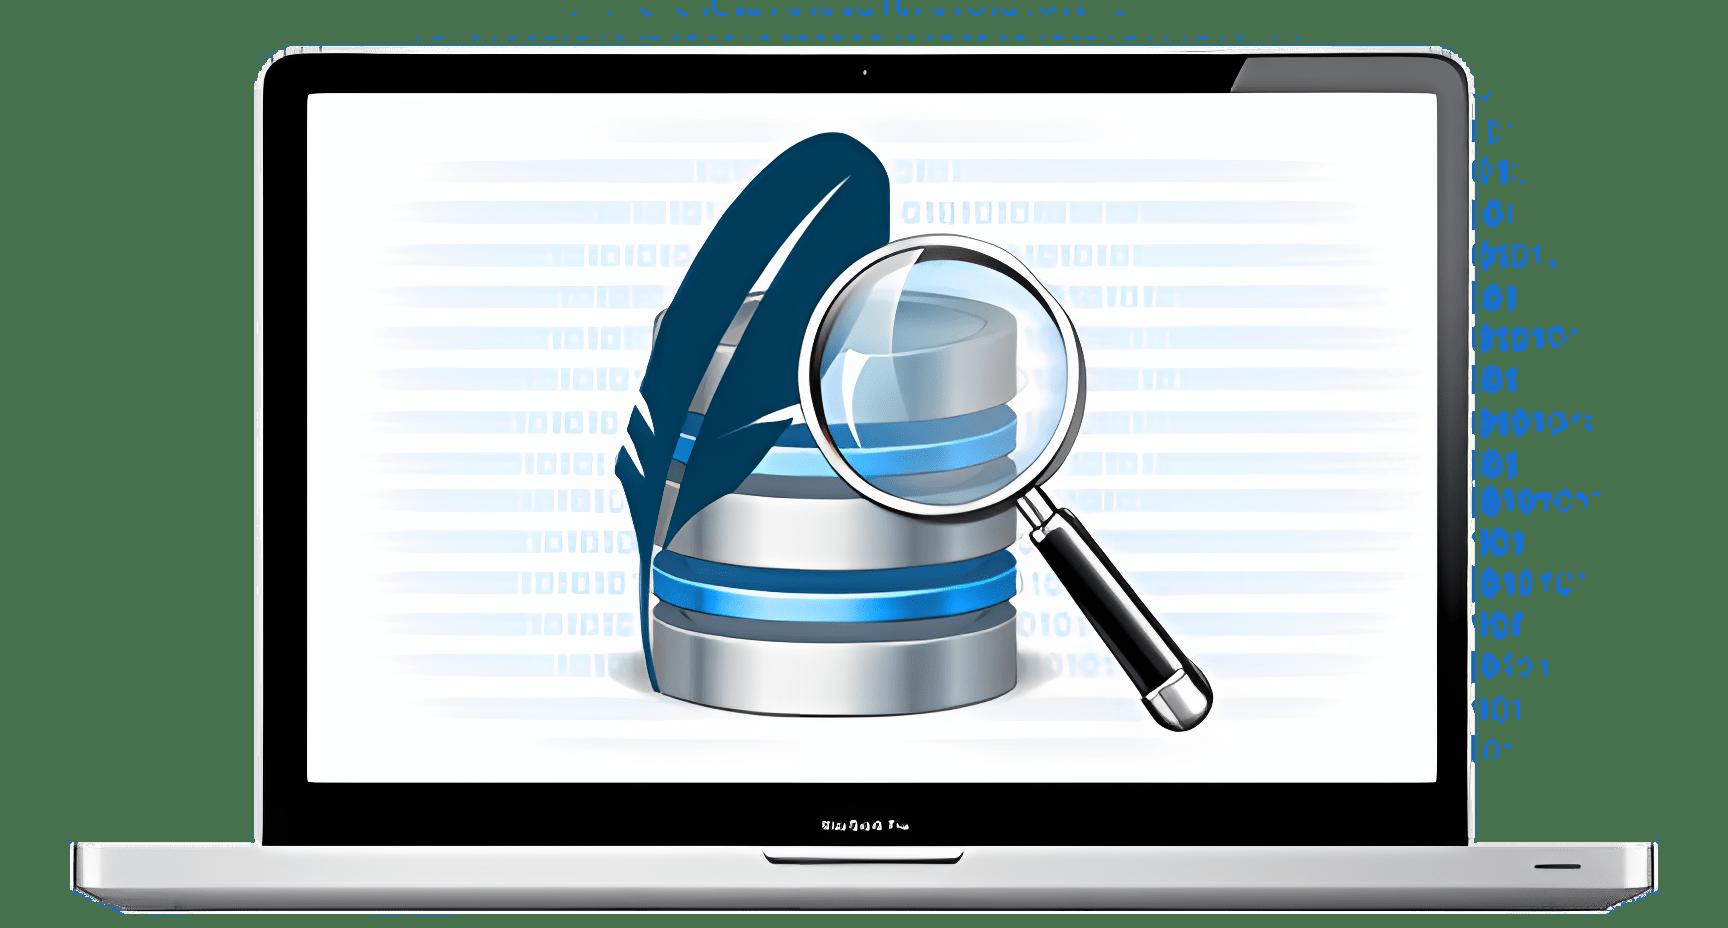 Acquire SQLite Forensic Explorer v2.0